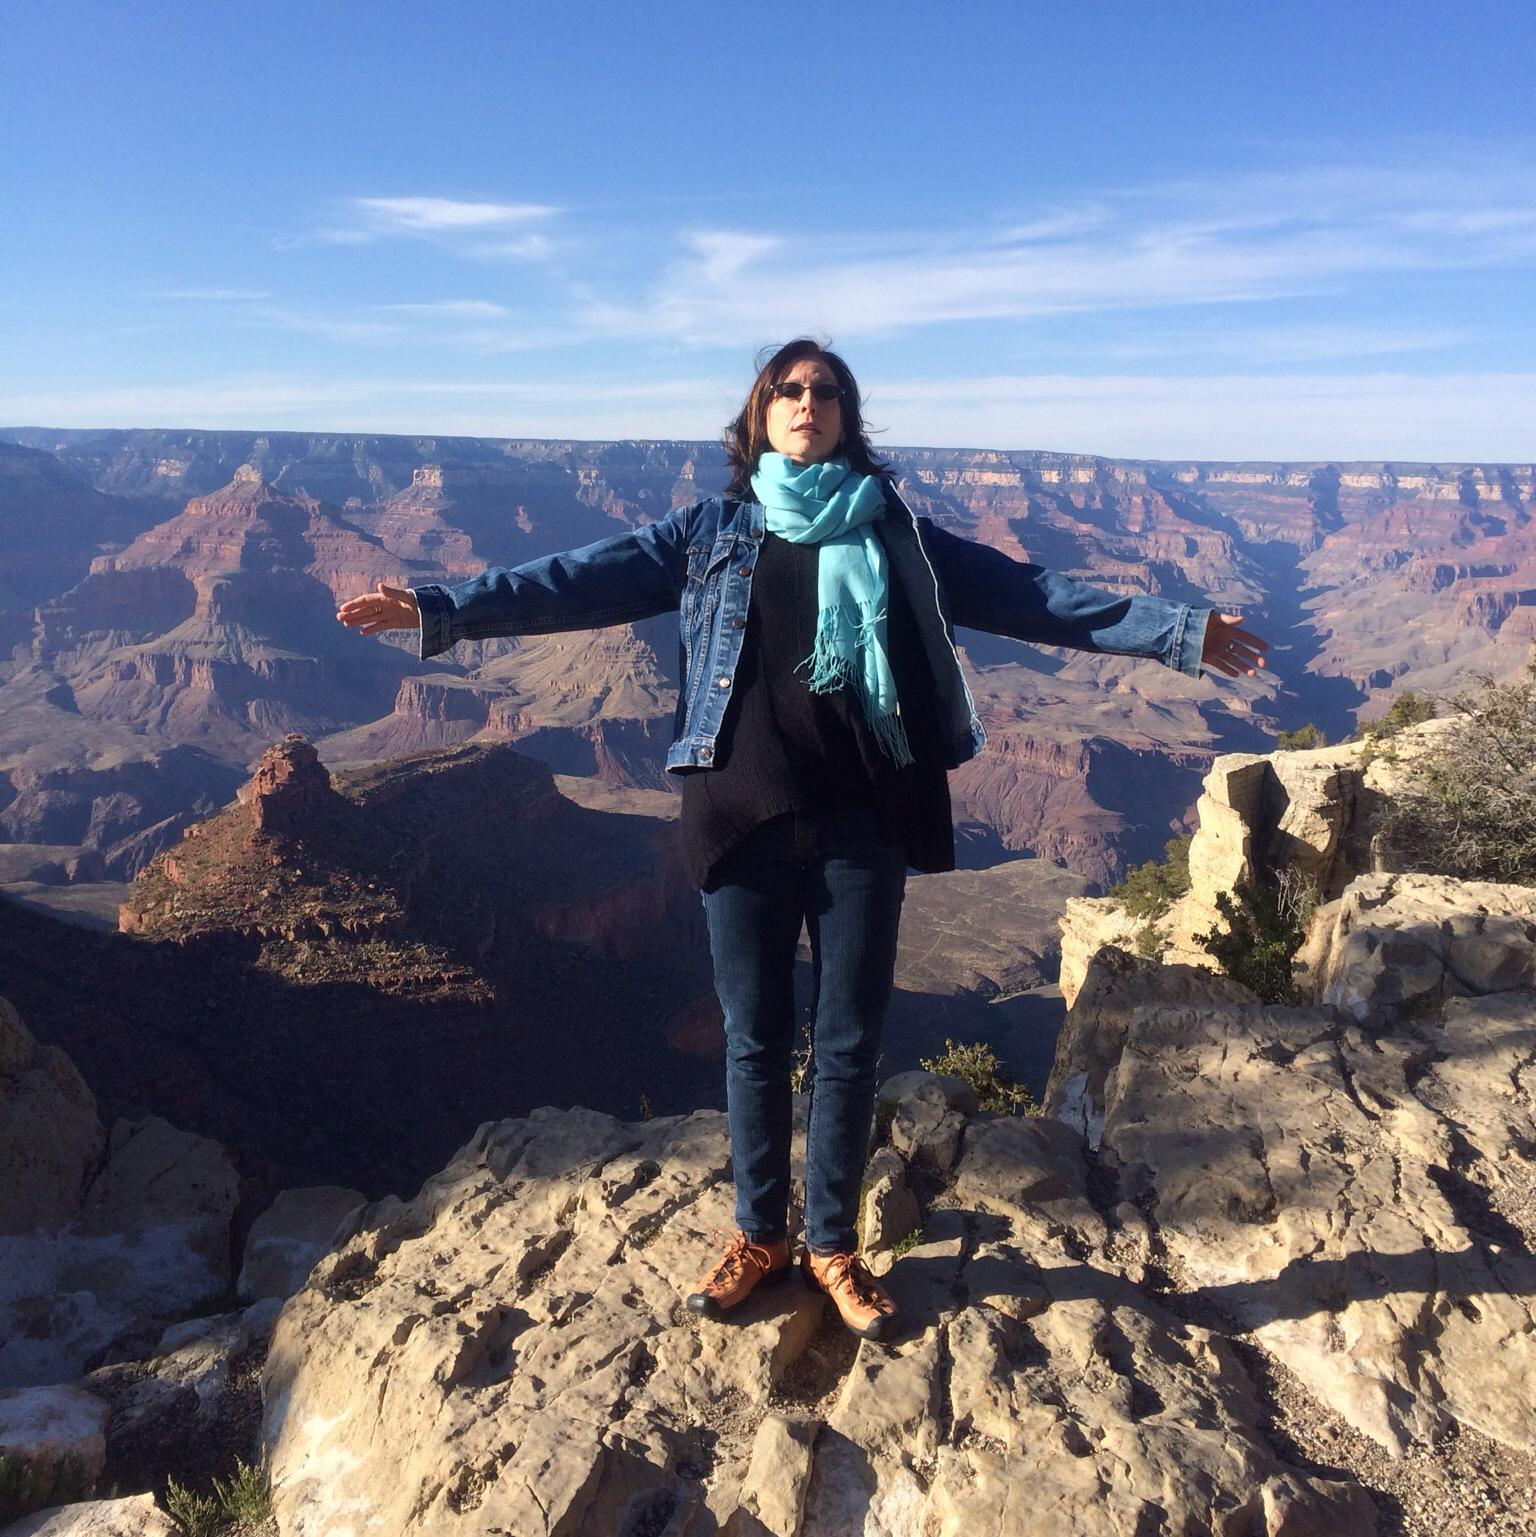 Katie McFadzen strikes a pose at the Grand Canyon.